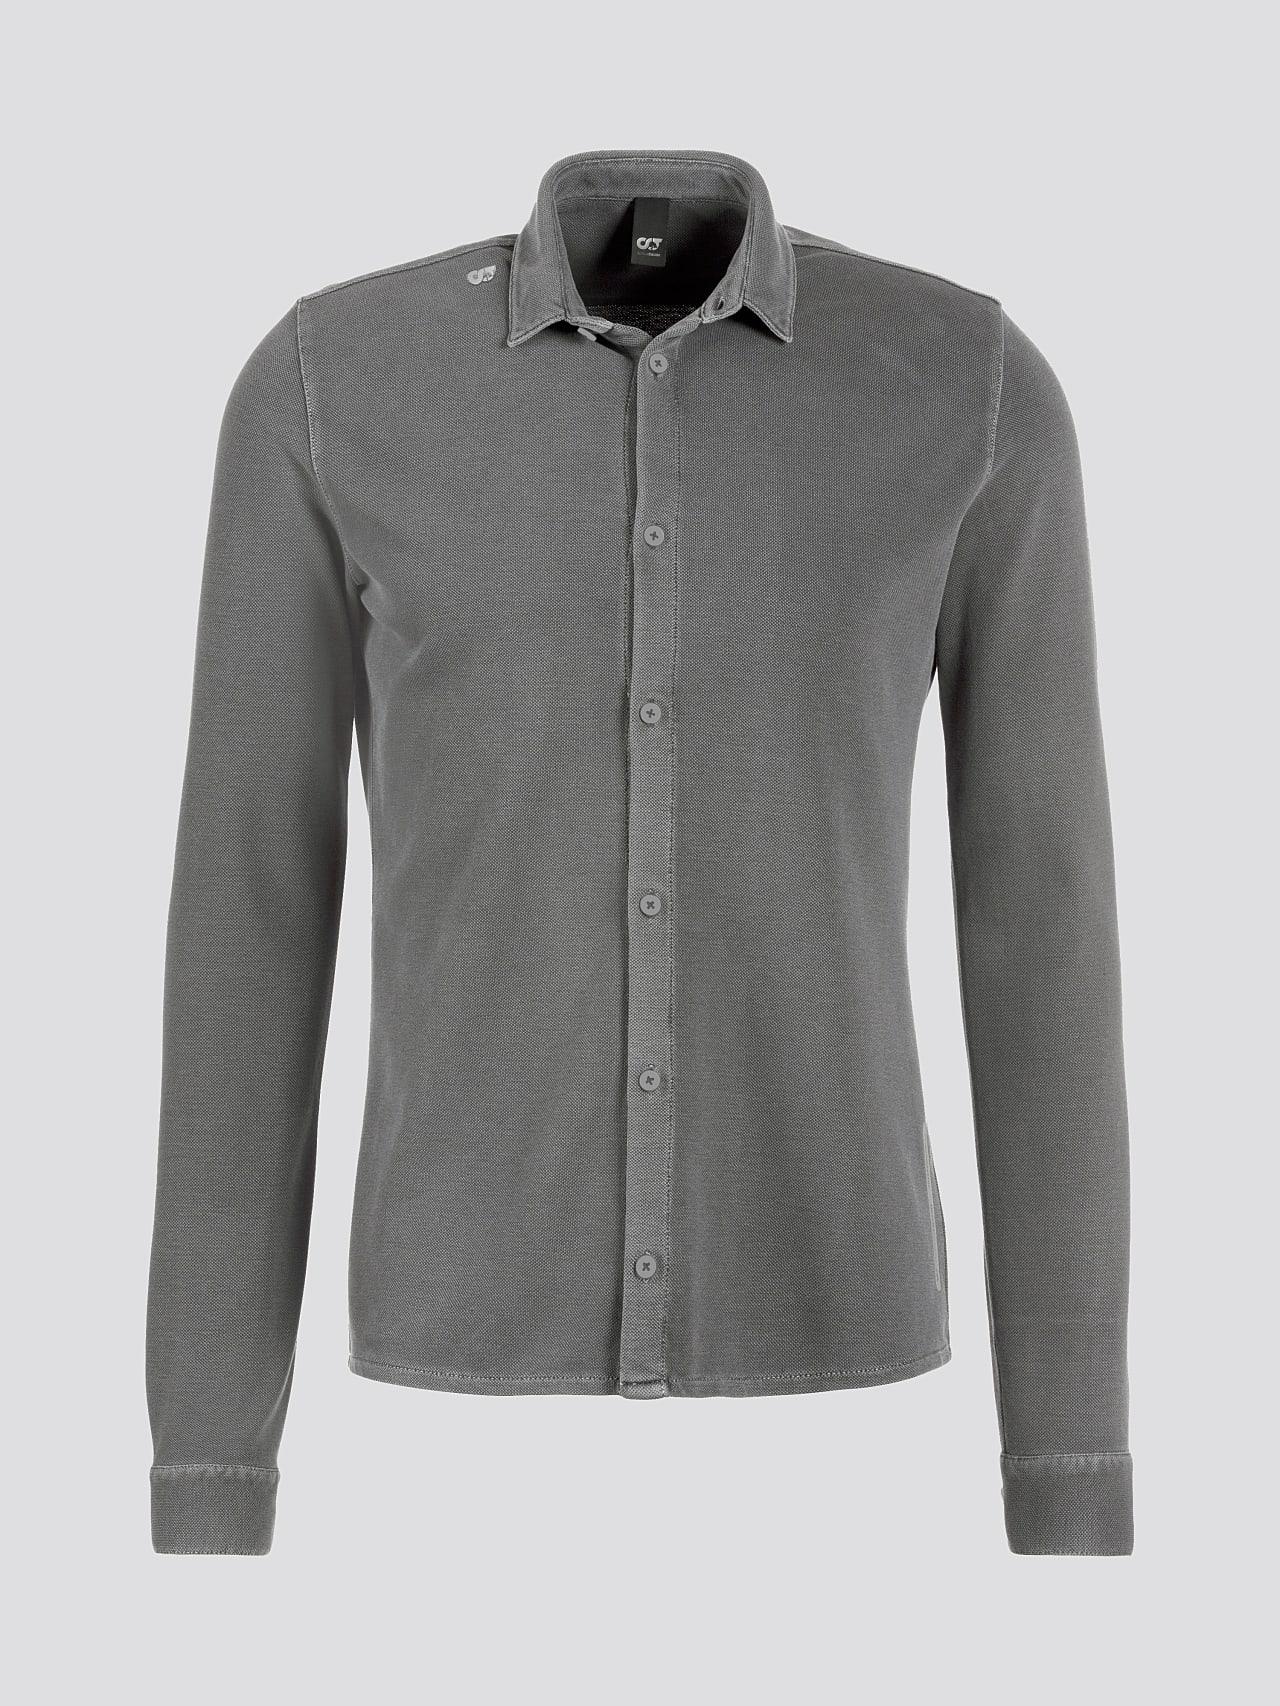 JIQUE V1.Y5.01 Pique Shirt with Kent Collar dark grey / anthracite Back Alpha Tauri